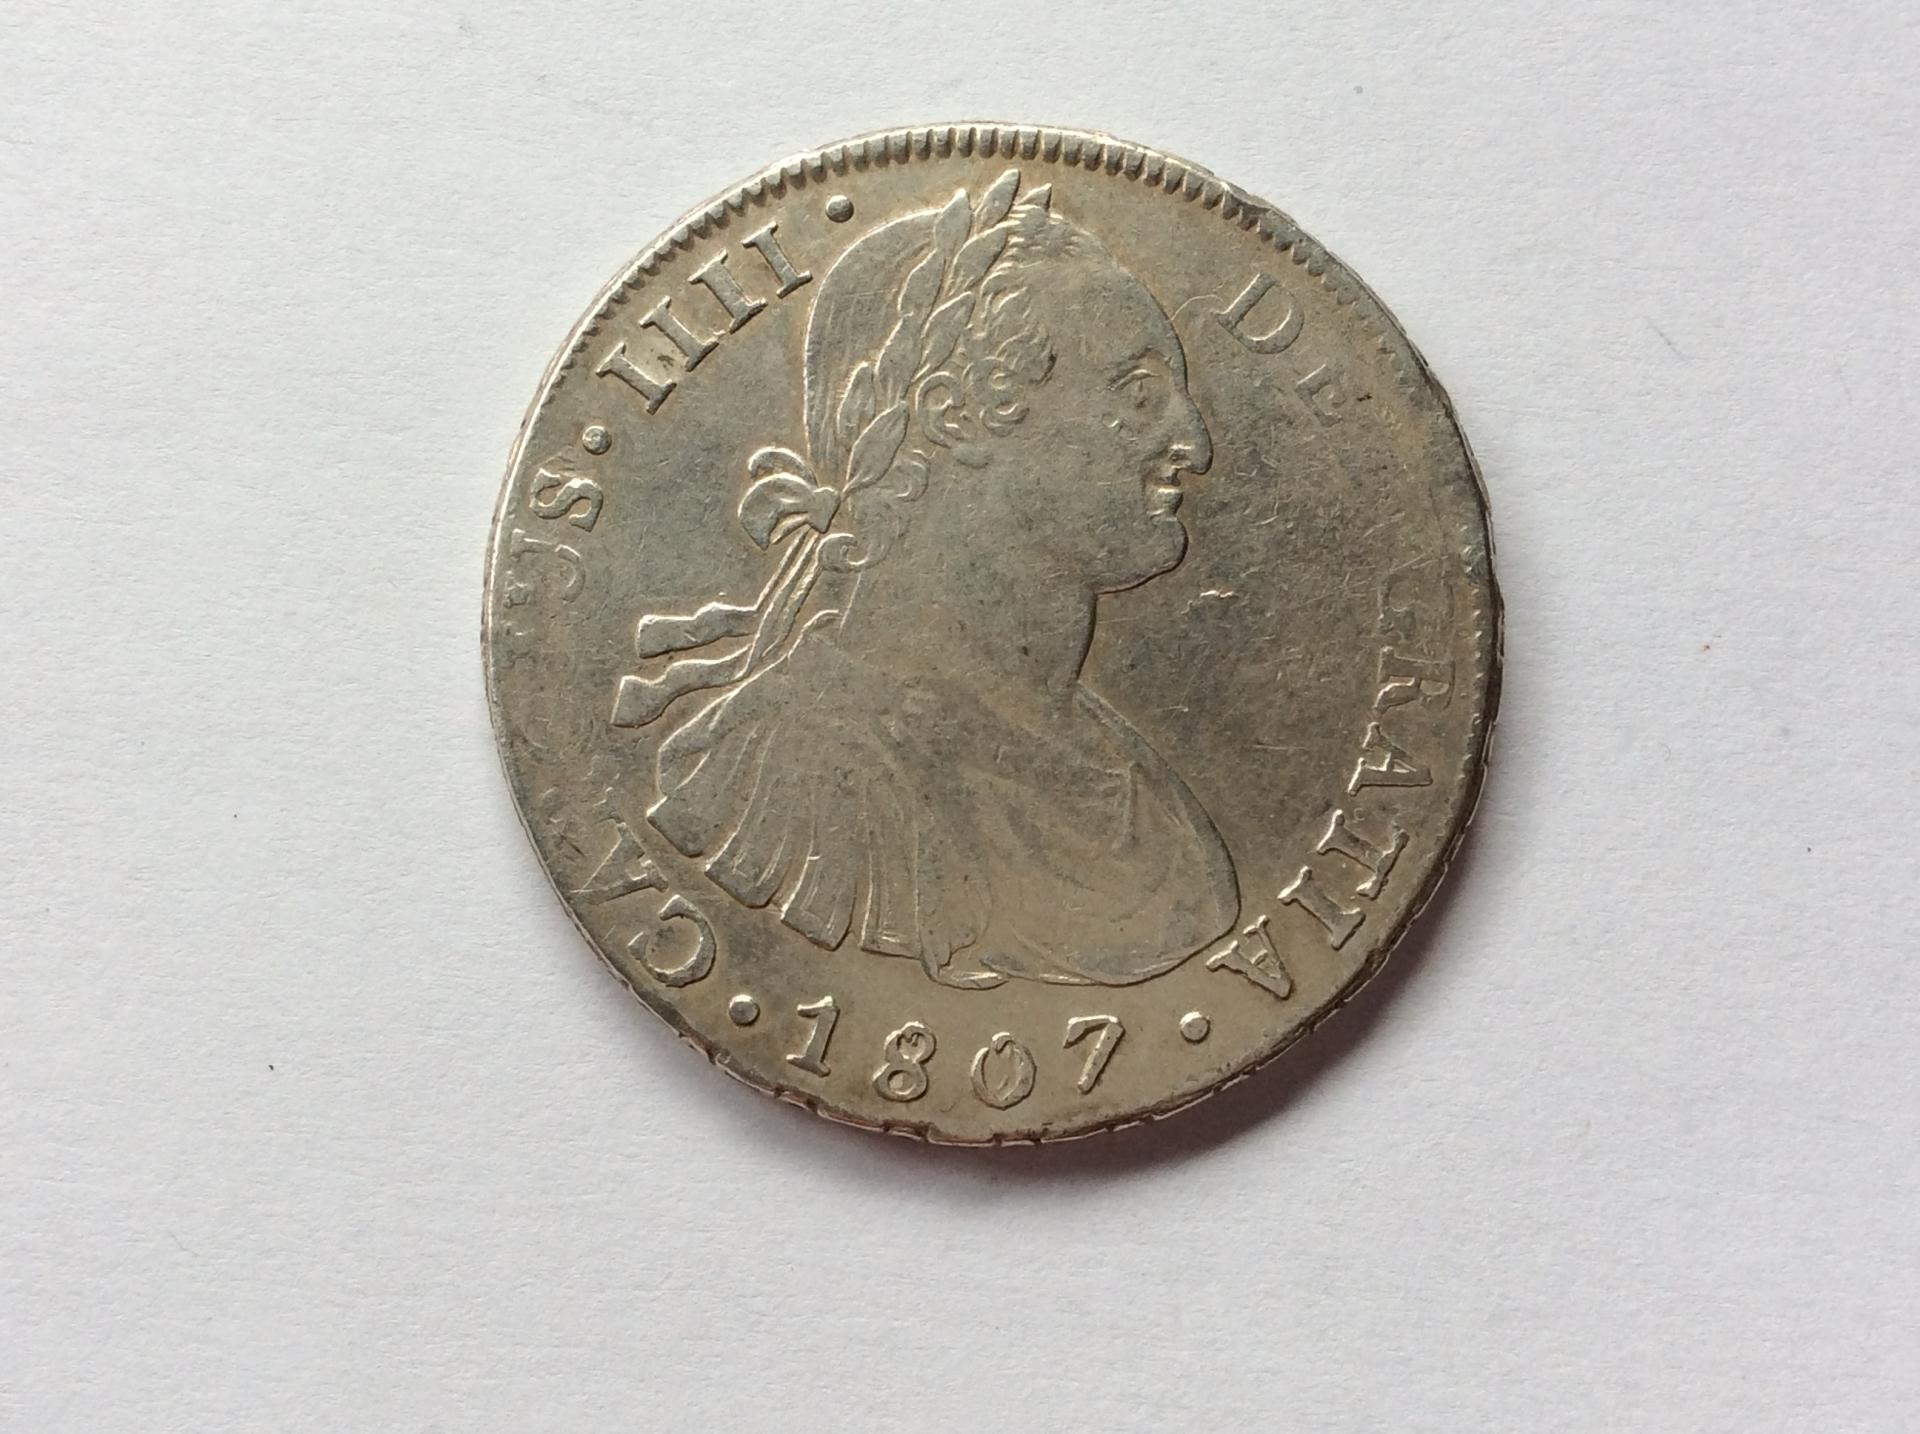 8 REALES PLATA 1807 - POTOSI - CARLOS IV